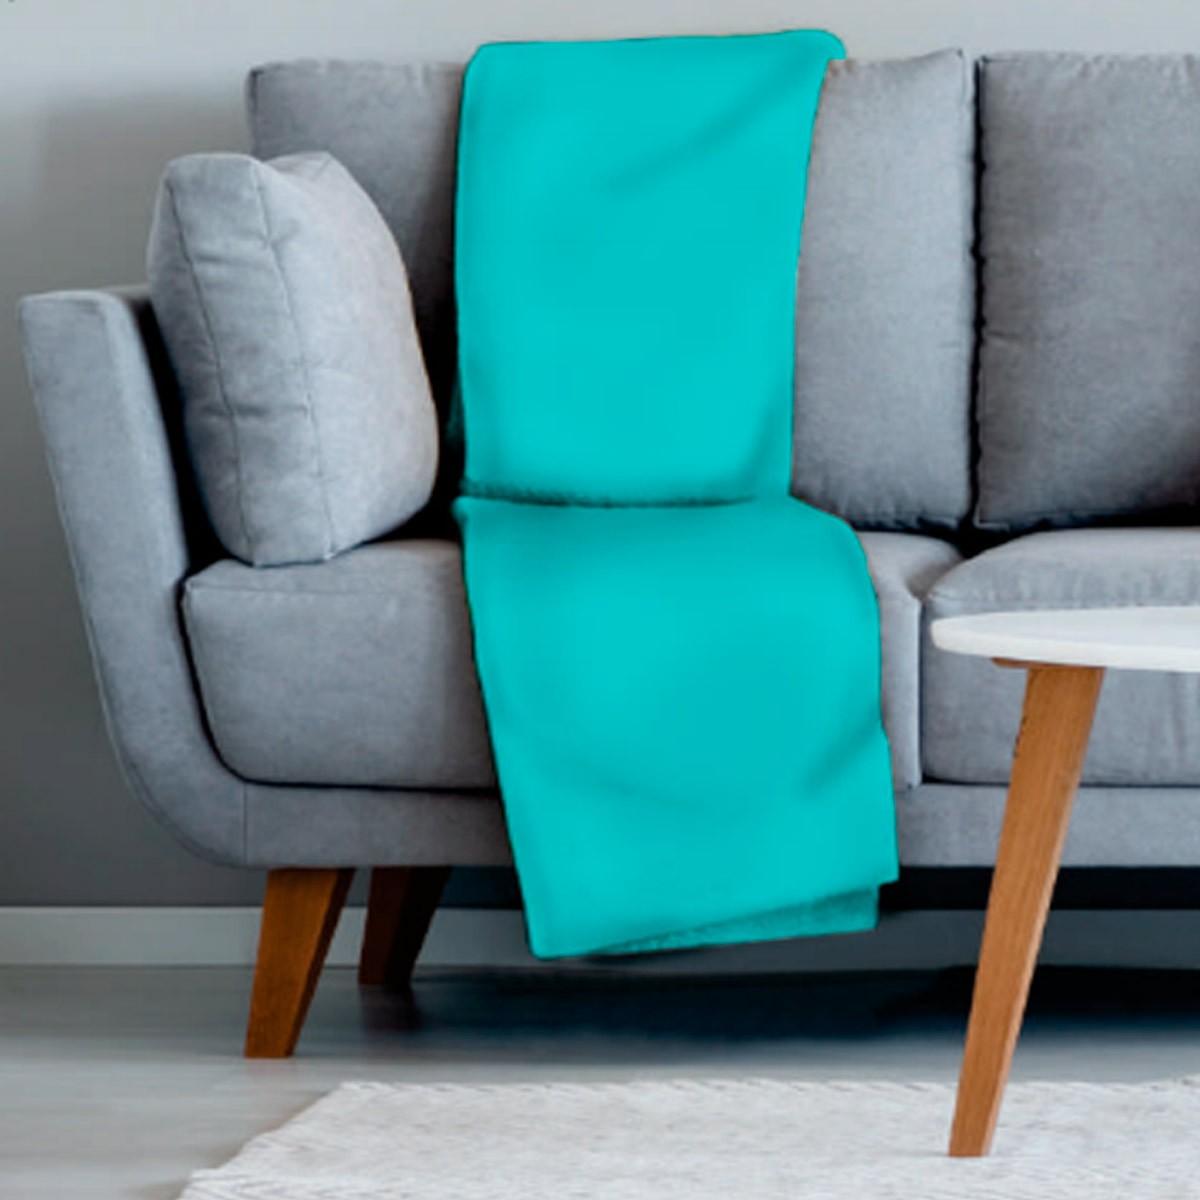 Manta sofa veludo 210x140 TURQUESA